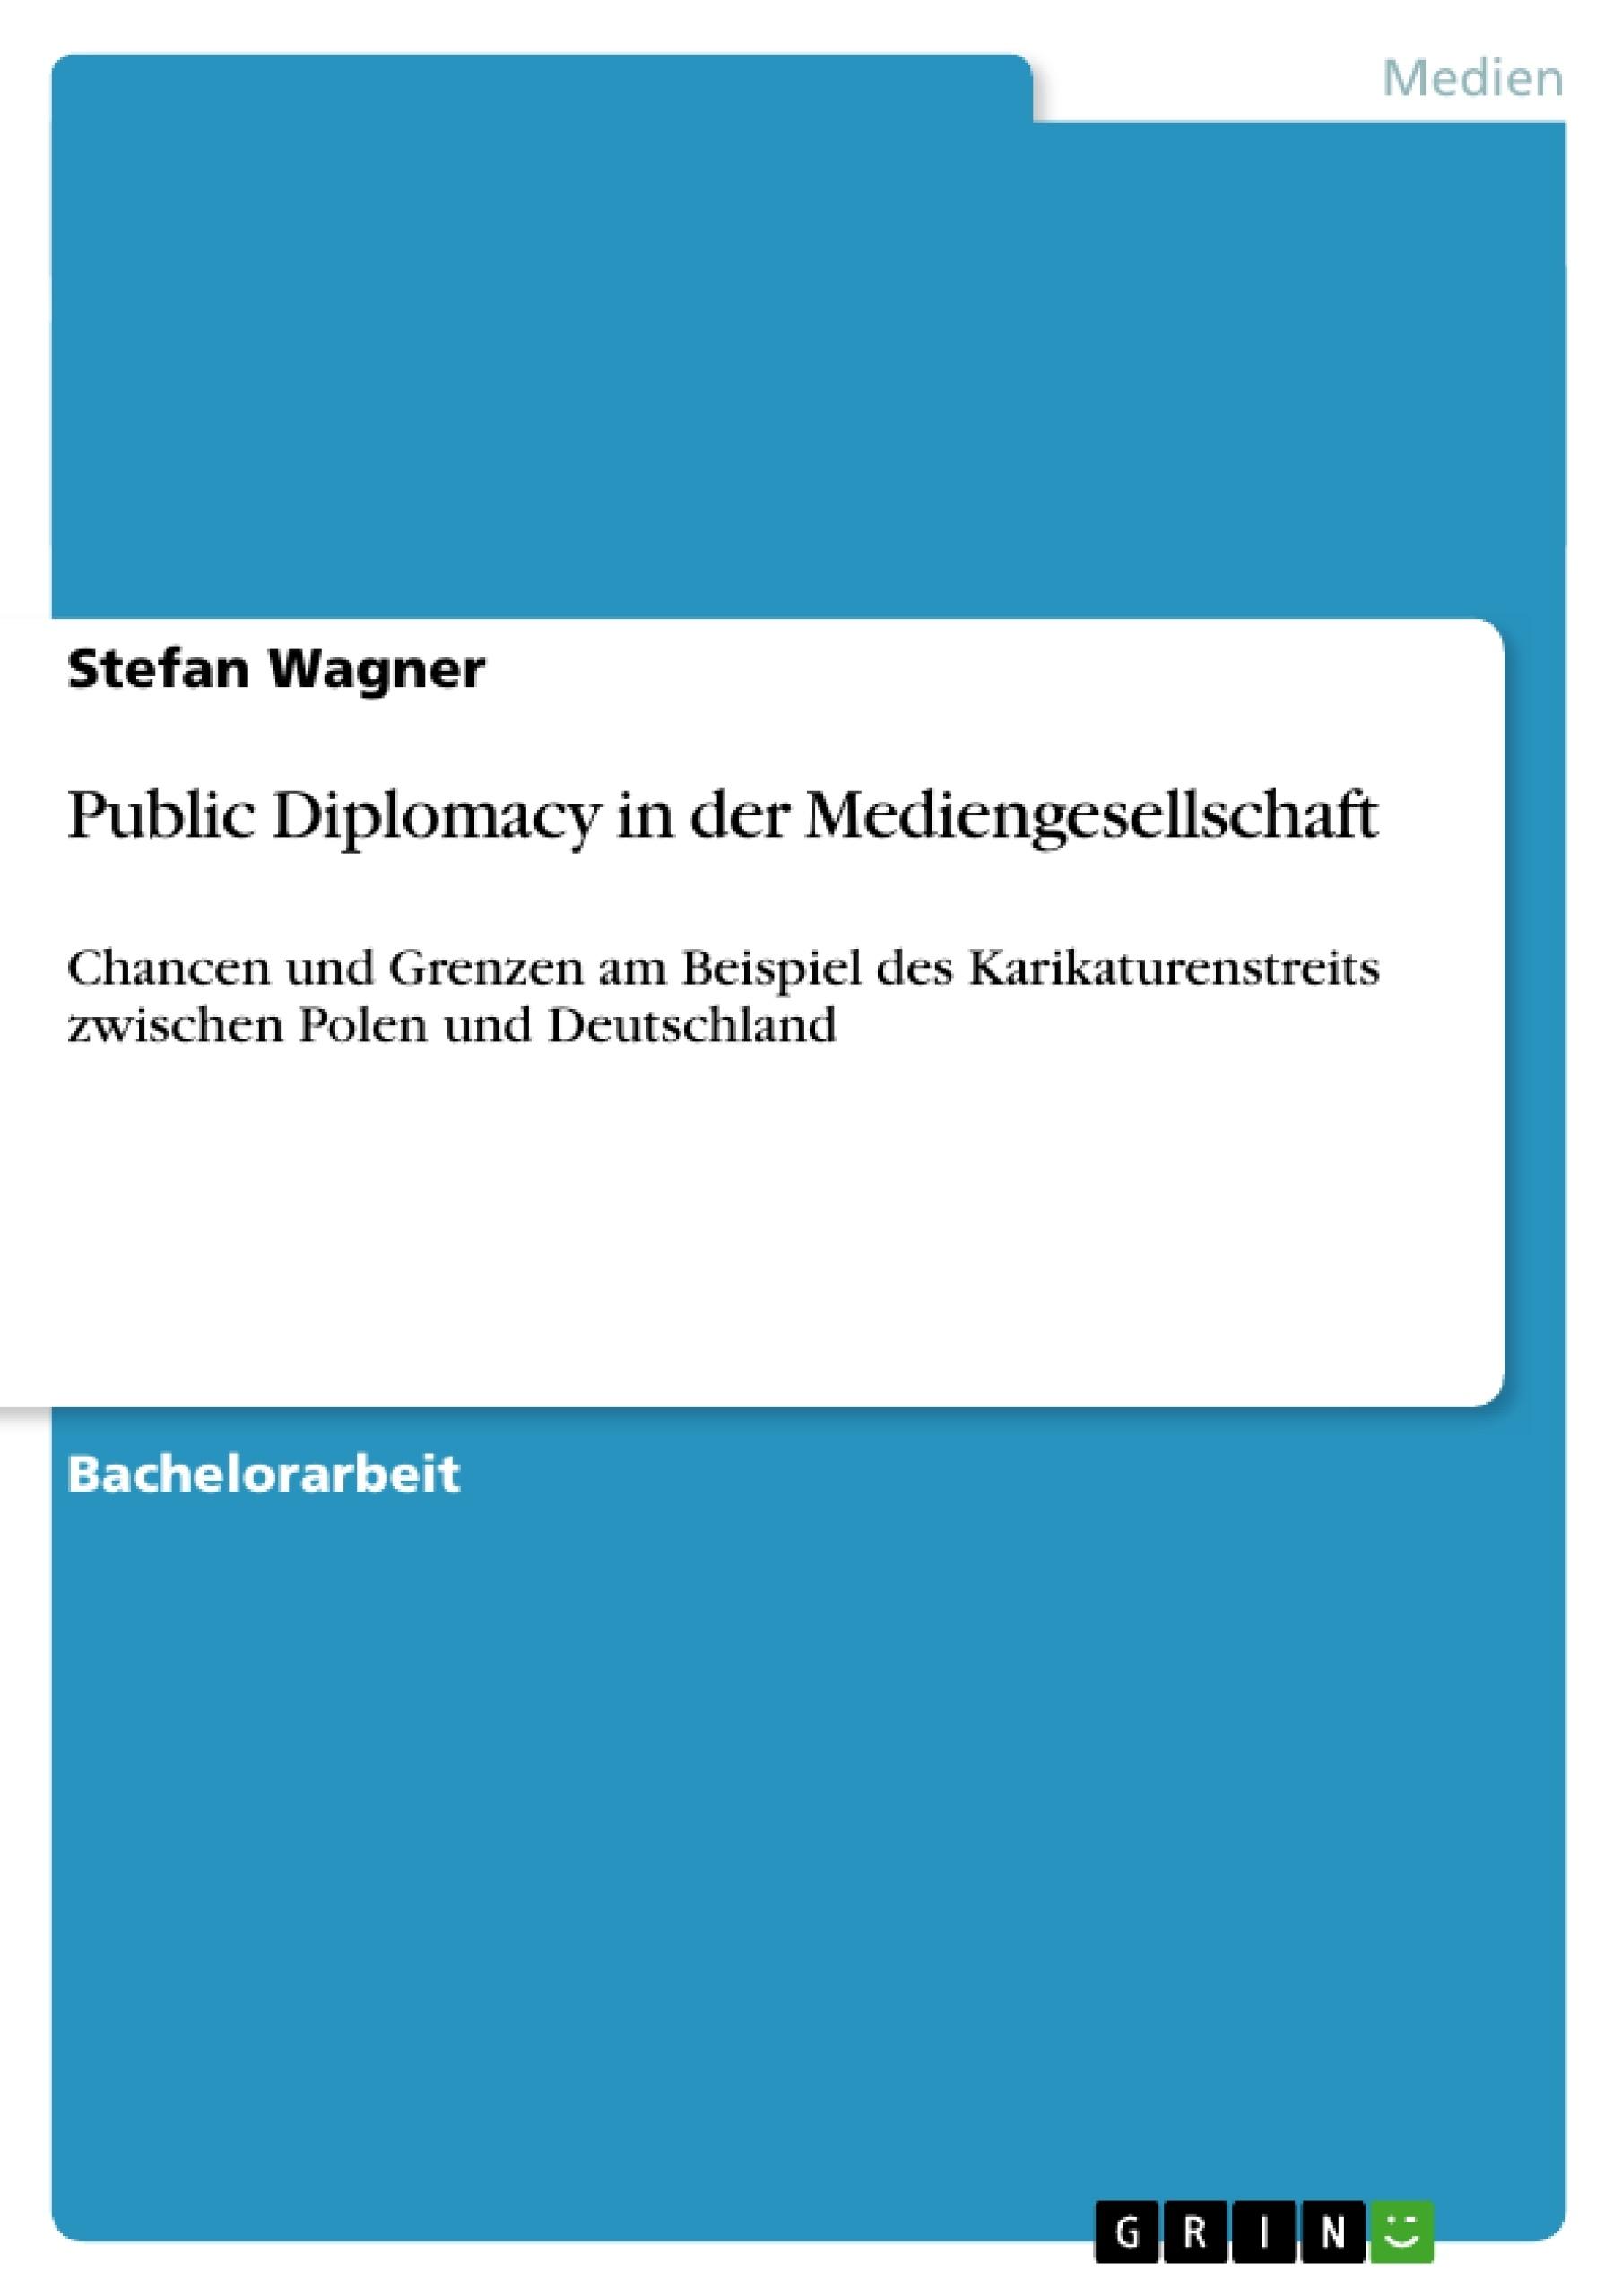 Titel: Public Diplomacy in der Mediengesellschaft